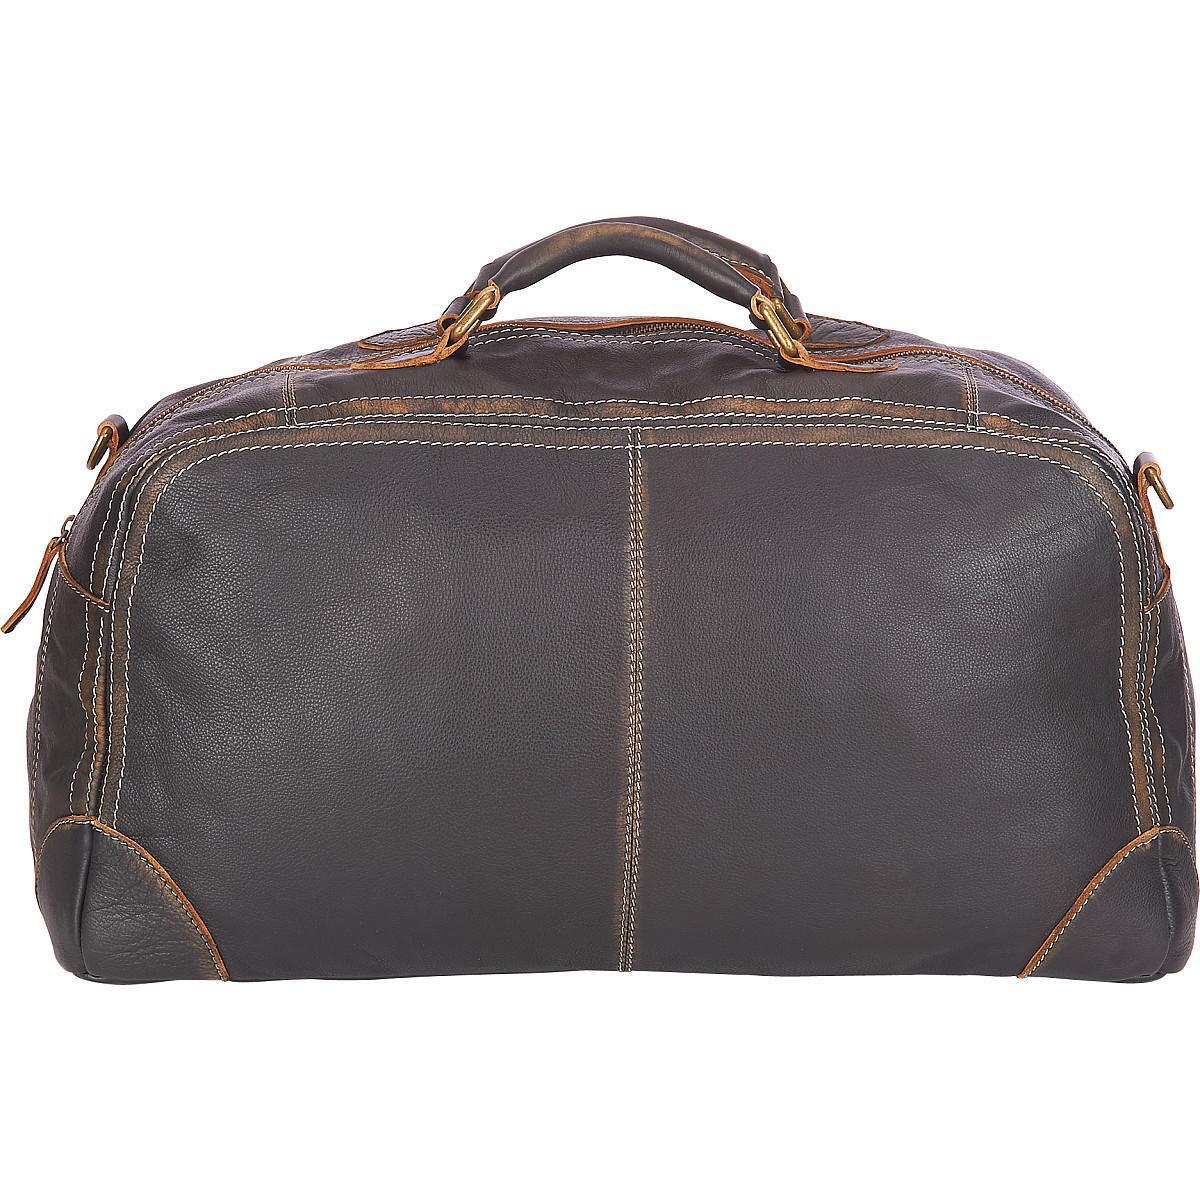 e15f722eba Lyst - Wilsons Leather Black Rivet Distressed Landon Leather Duffel ...